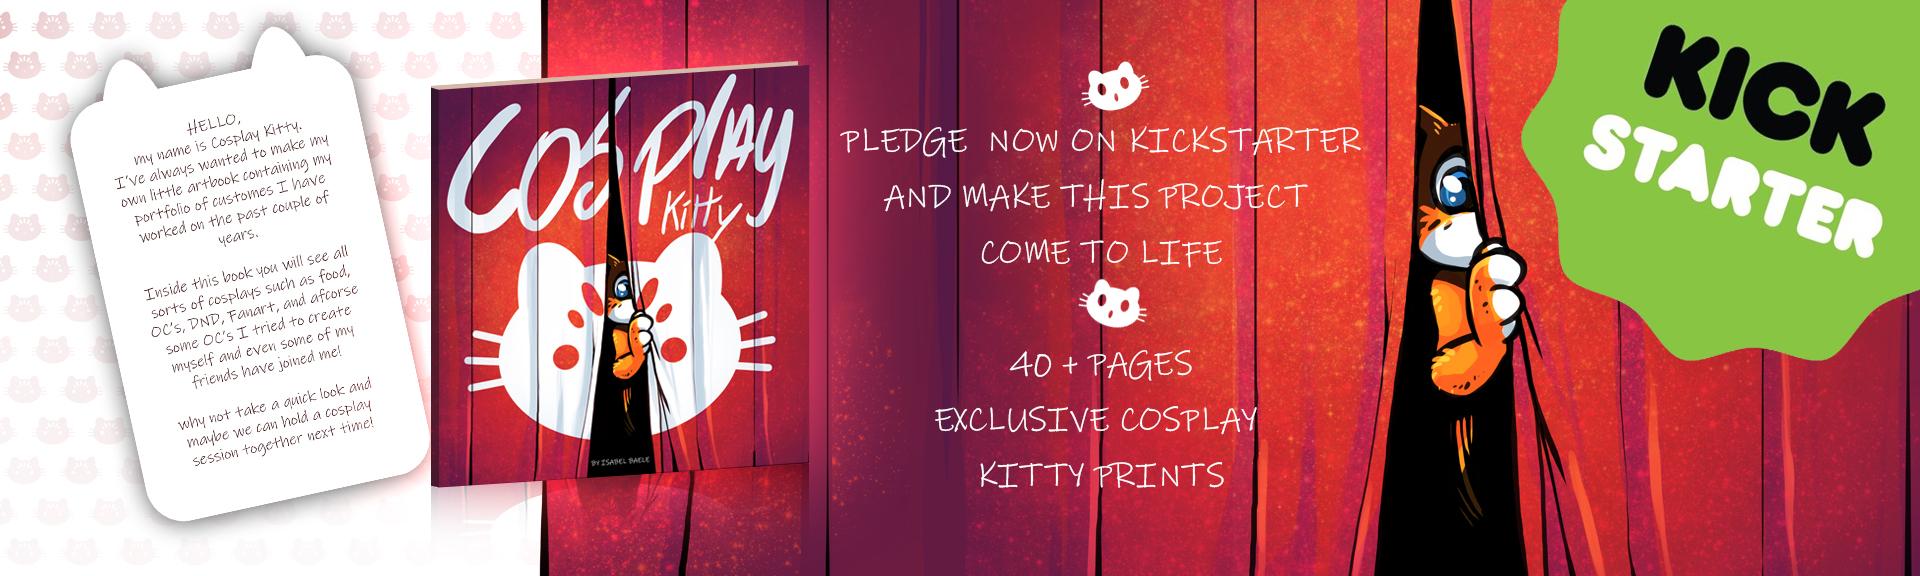 Cosplay Kitty kickstarter banner